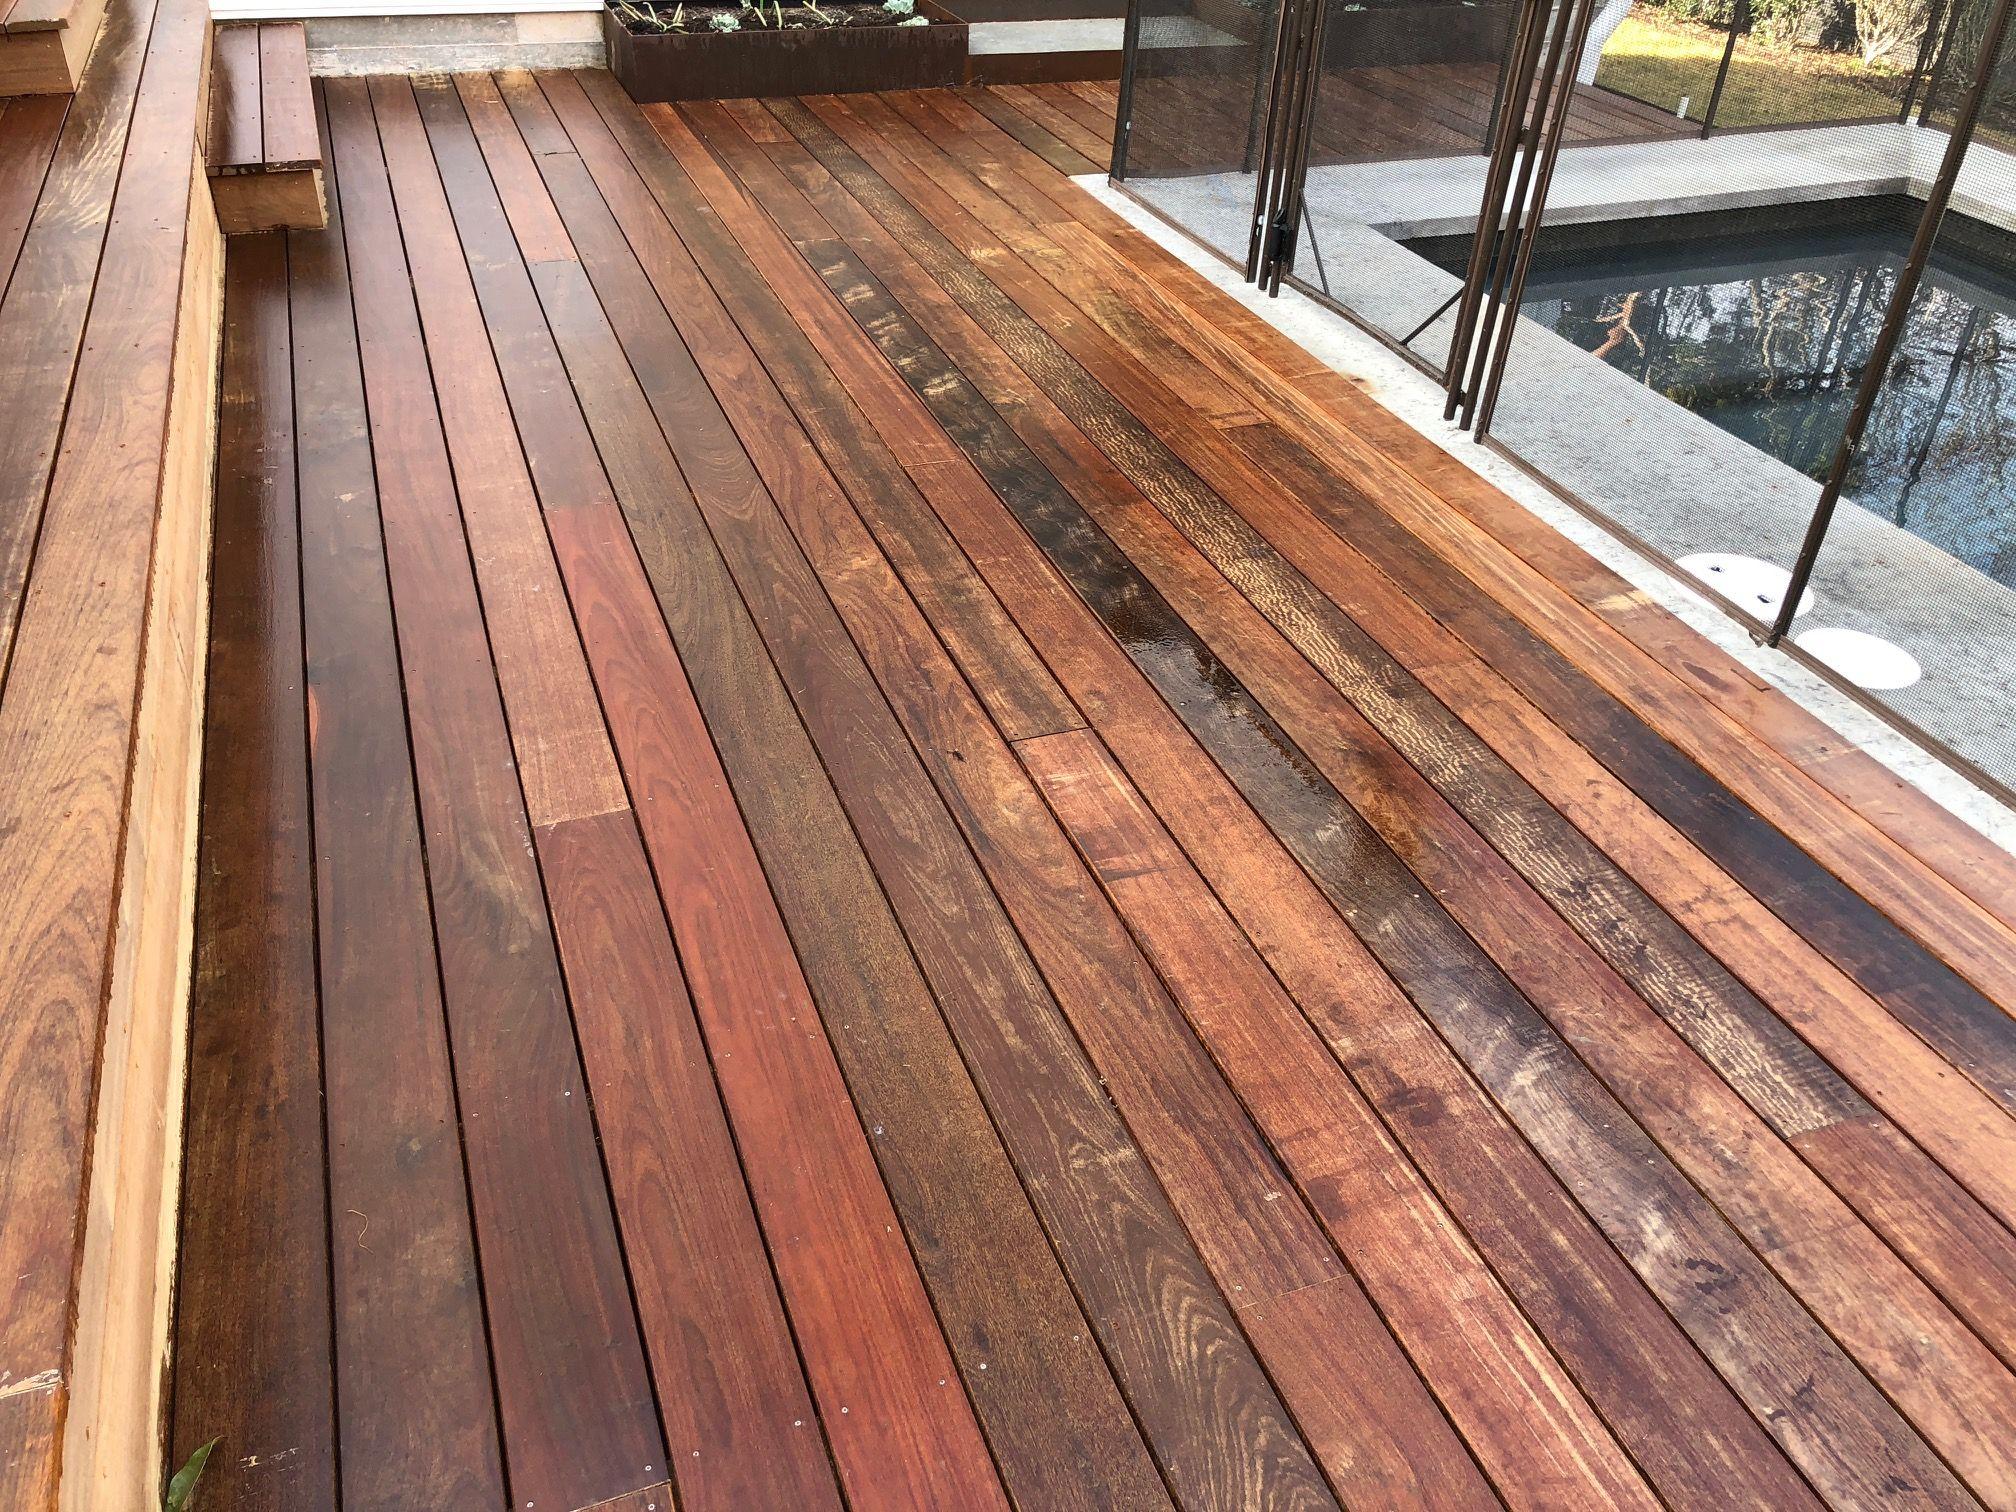 Pin By Donny Van Court On Decking Hardwood Decking Decking Options Deck